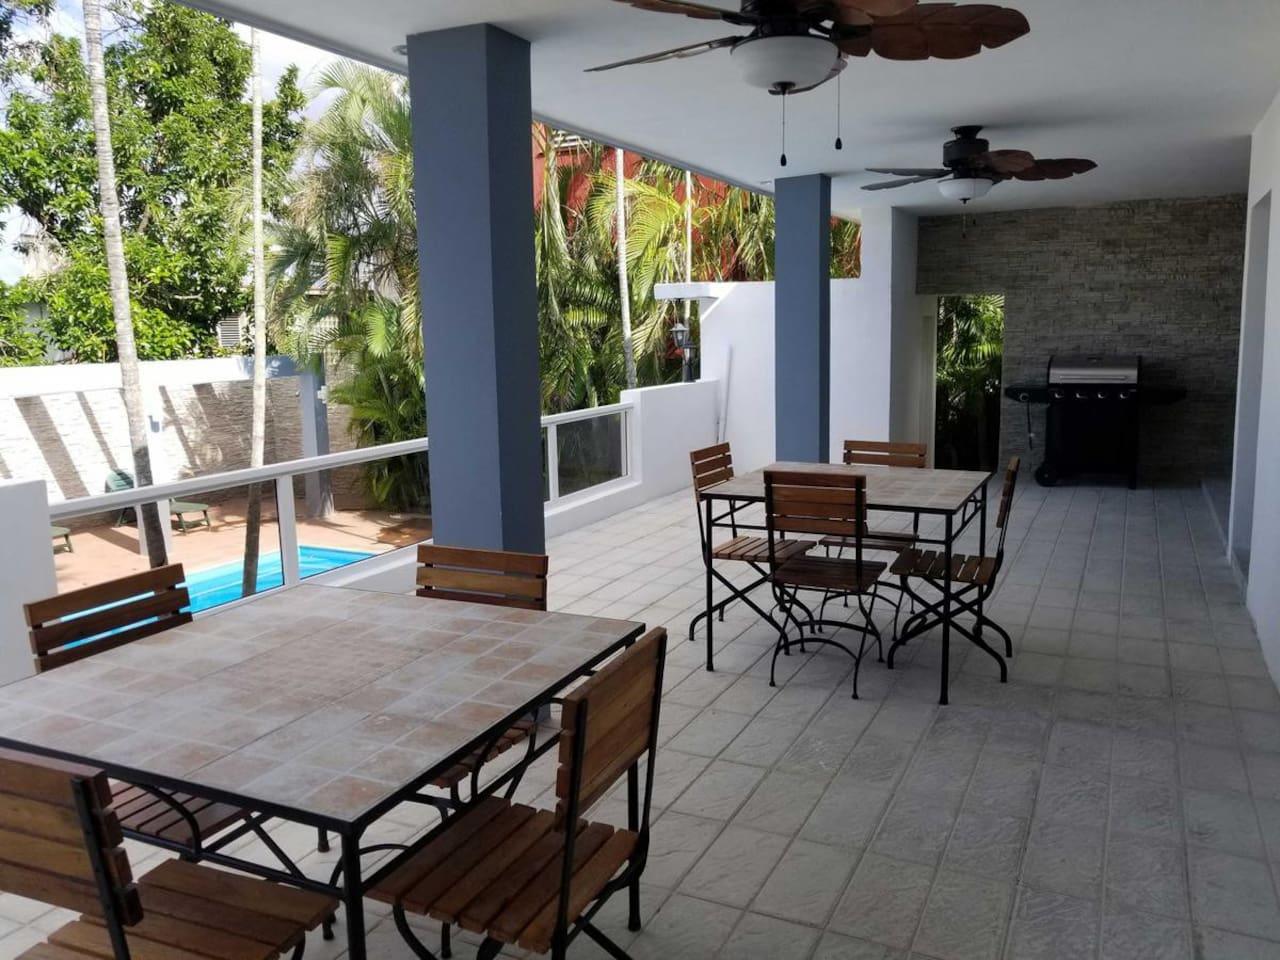 Villa Don Teto Suite & 8 Rooms: Great Havana View photo 23332252